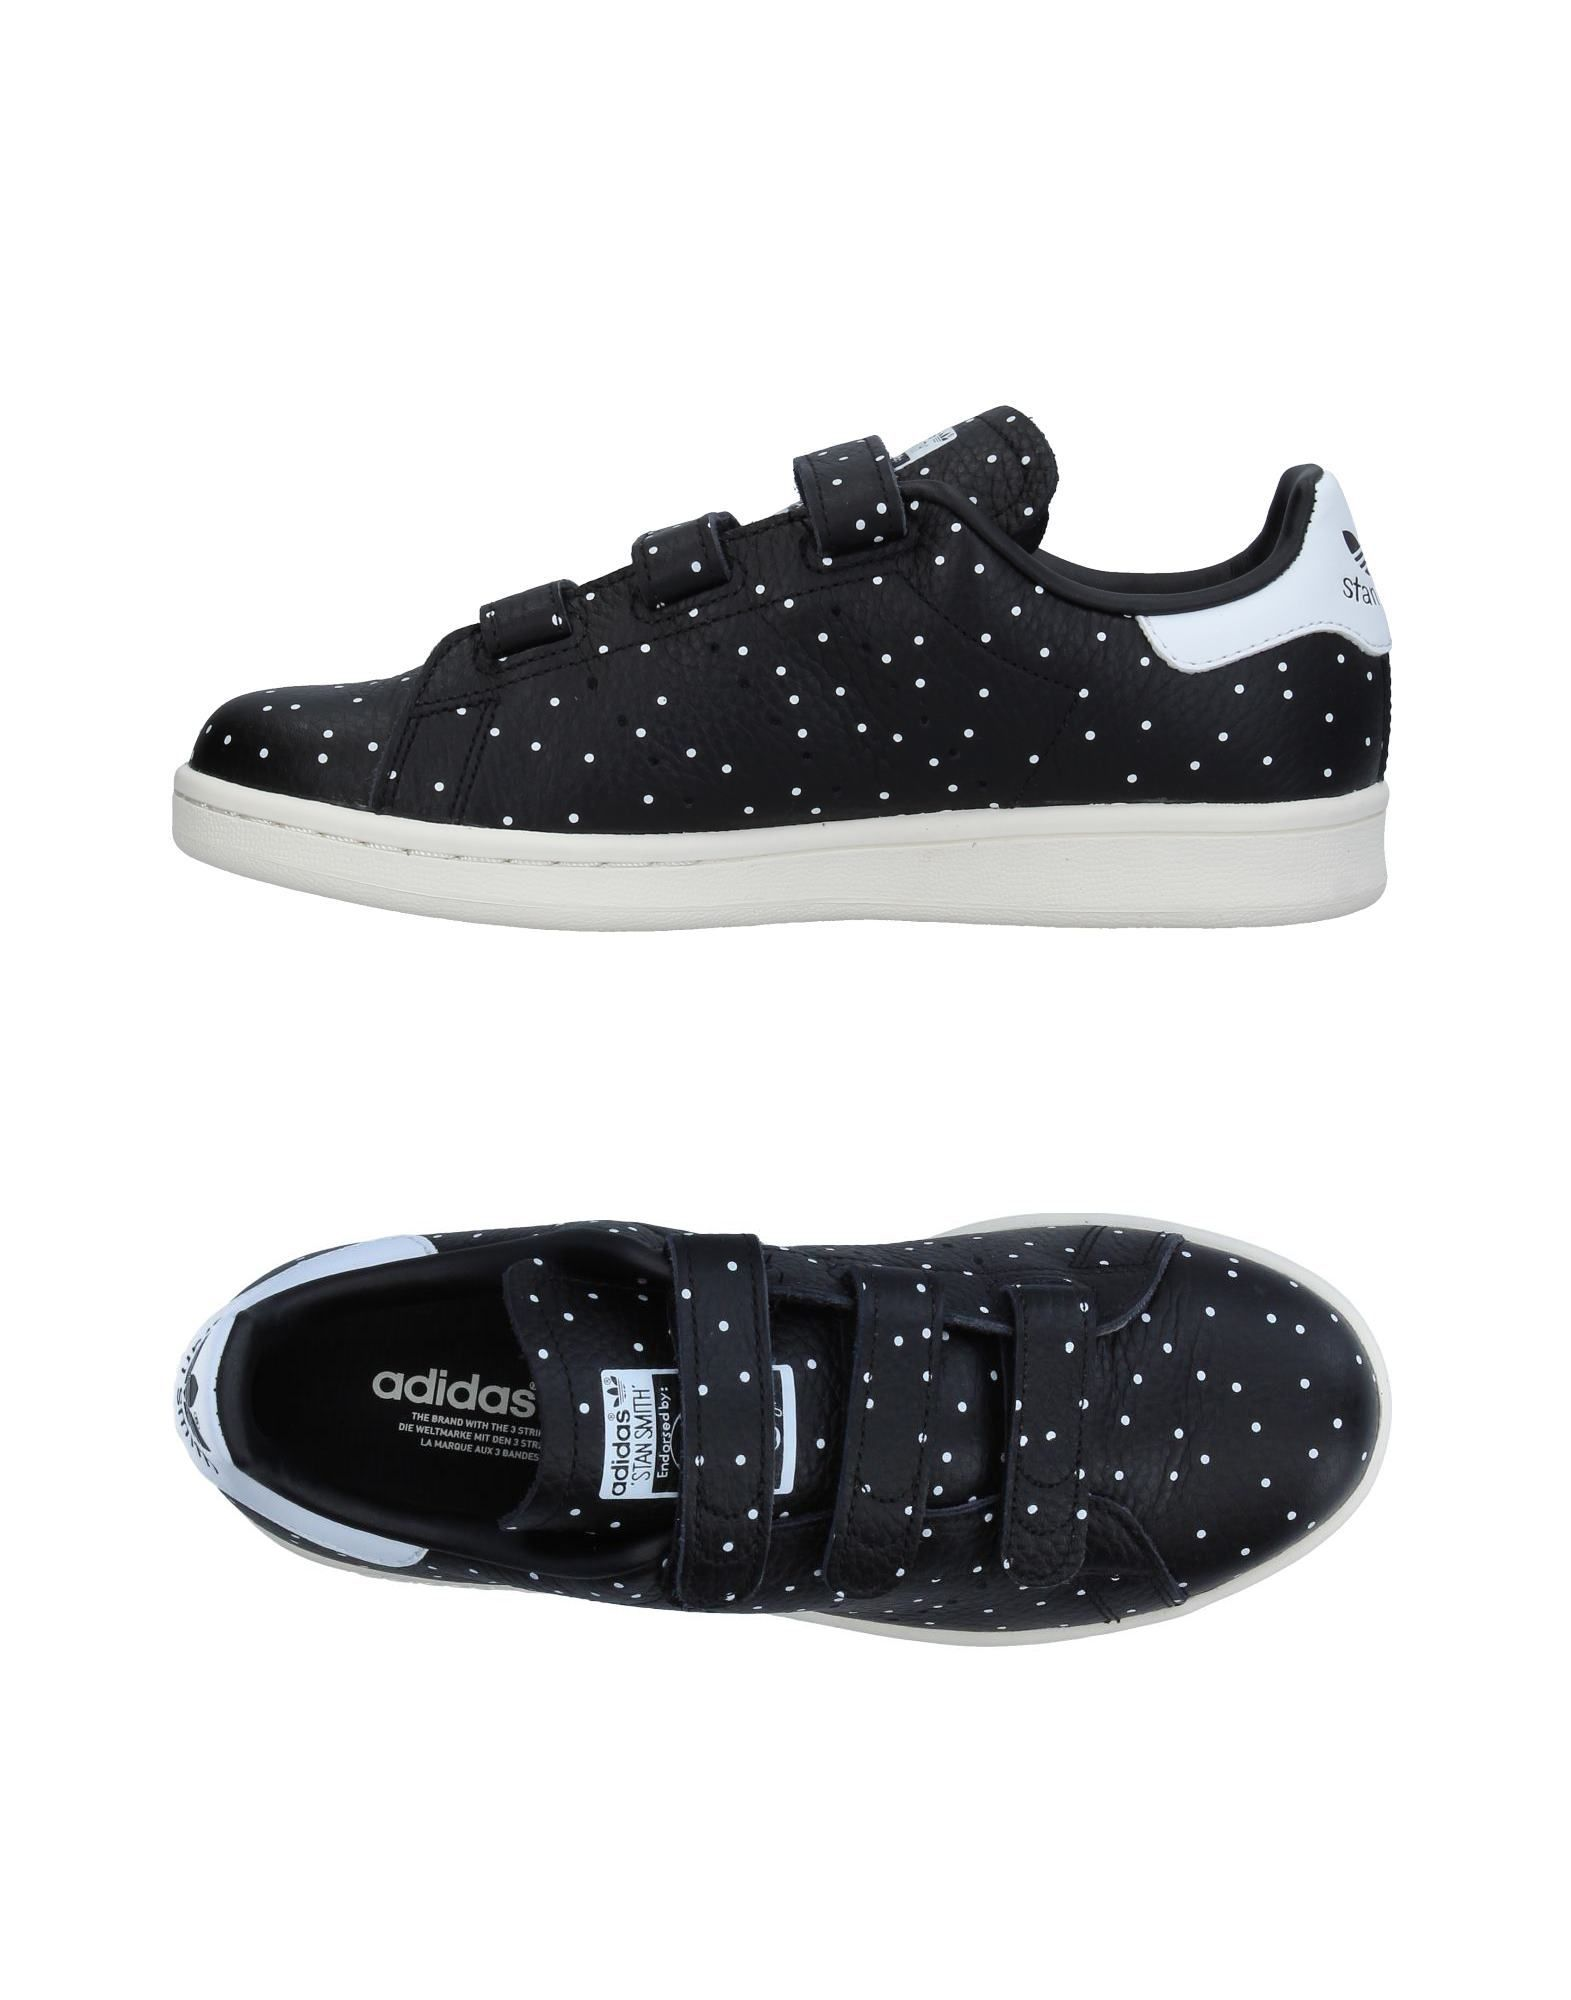 Adidas 11335749KI Originals Sneakers Damen  11335749KI Adidas Gute Qualität beliebte Schuhe cc55b8